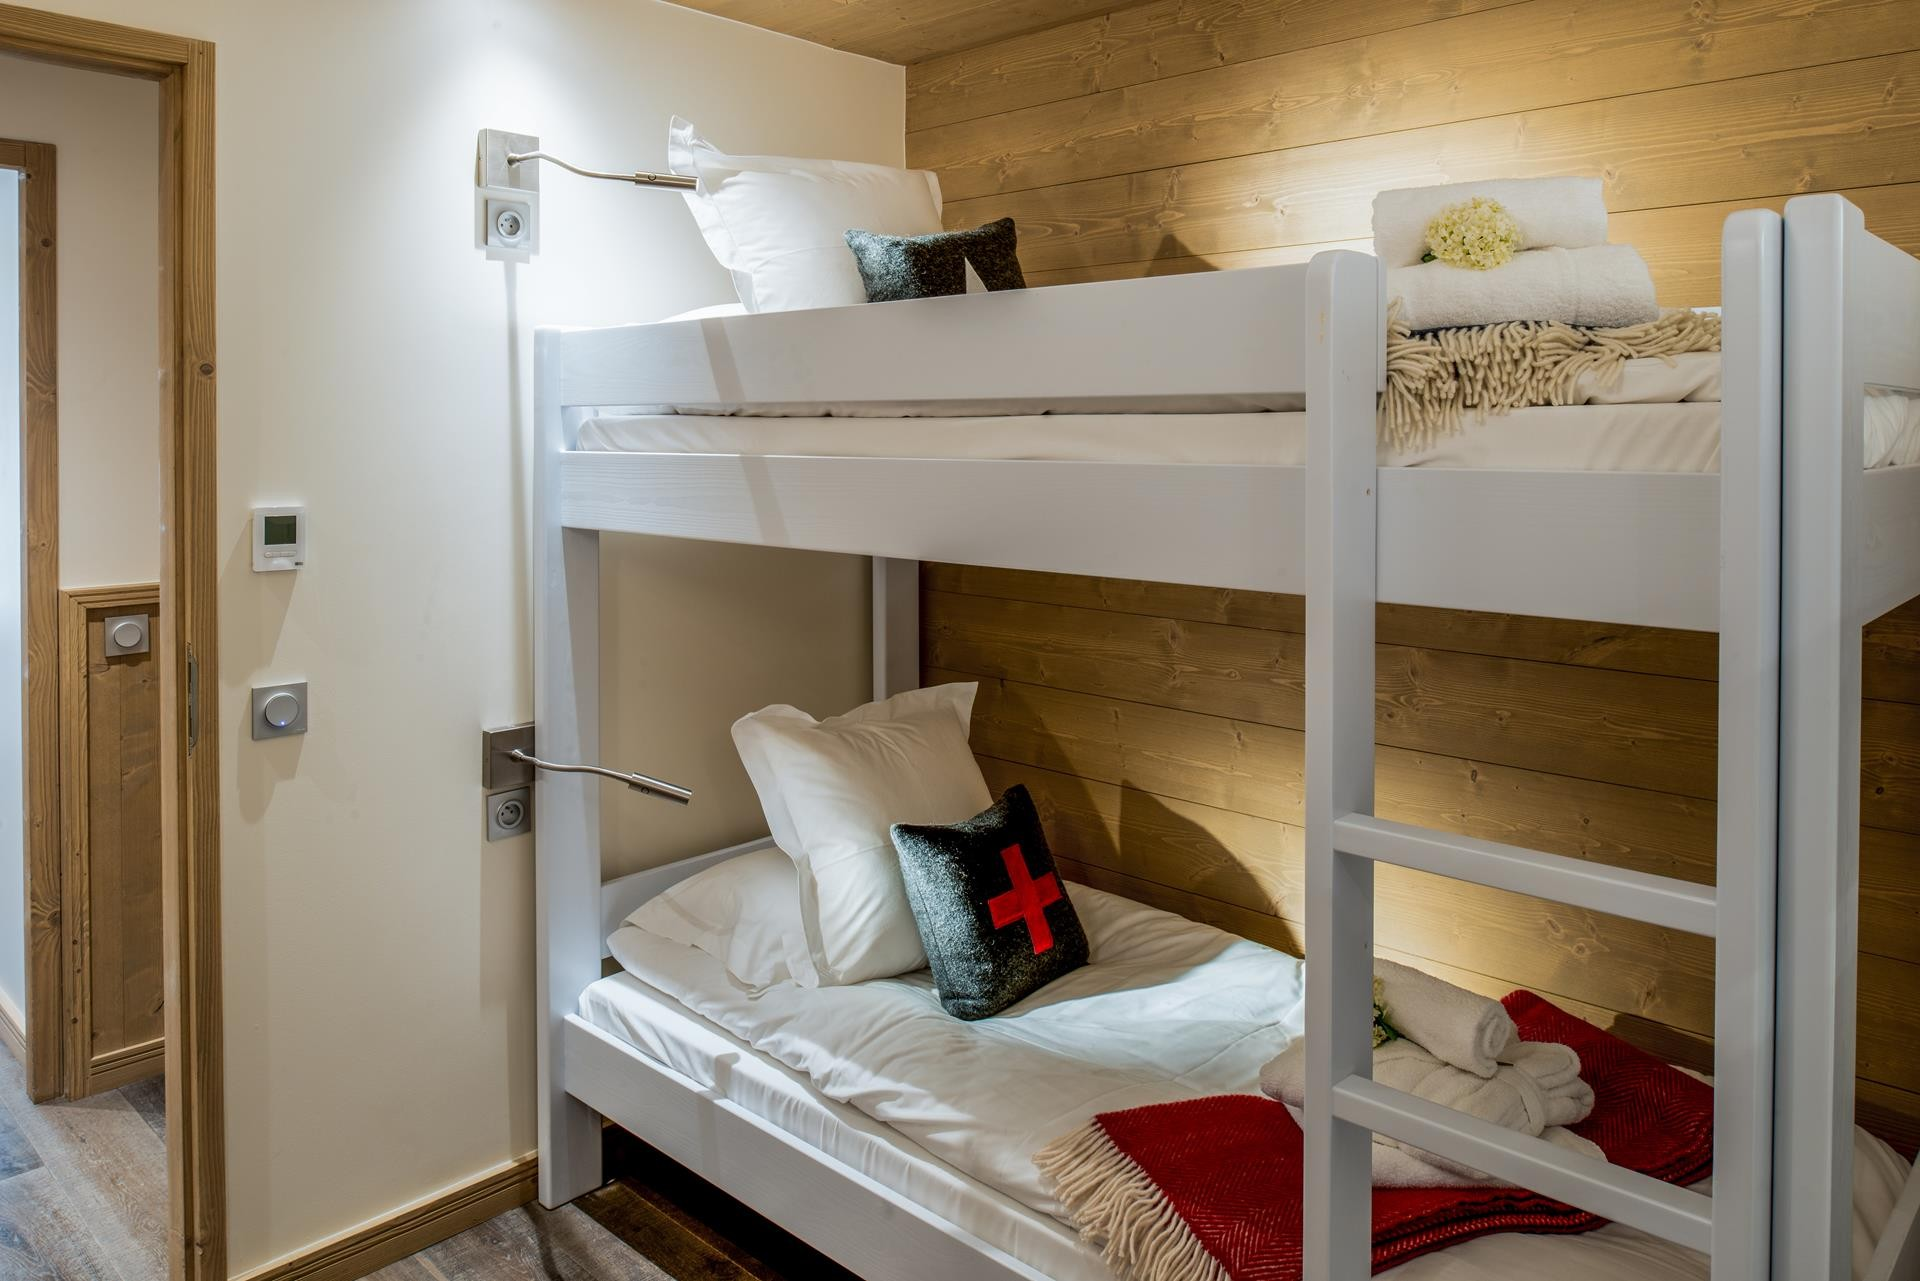 Courchevel 1650 Location Appartement Luxe Amarile Chambre